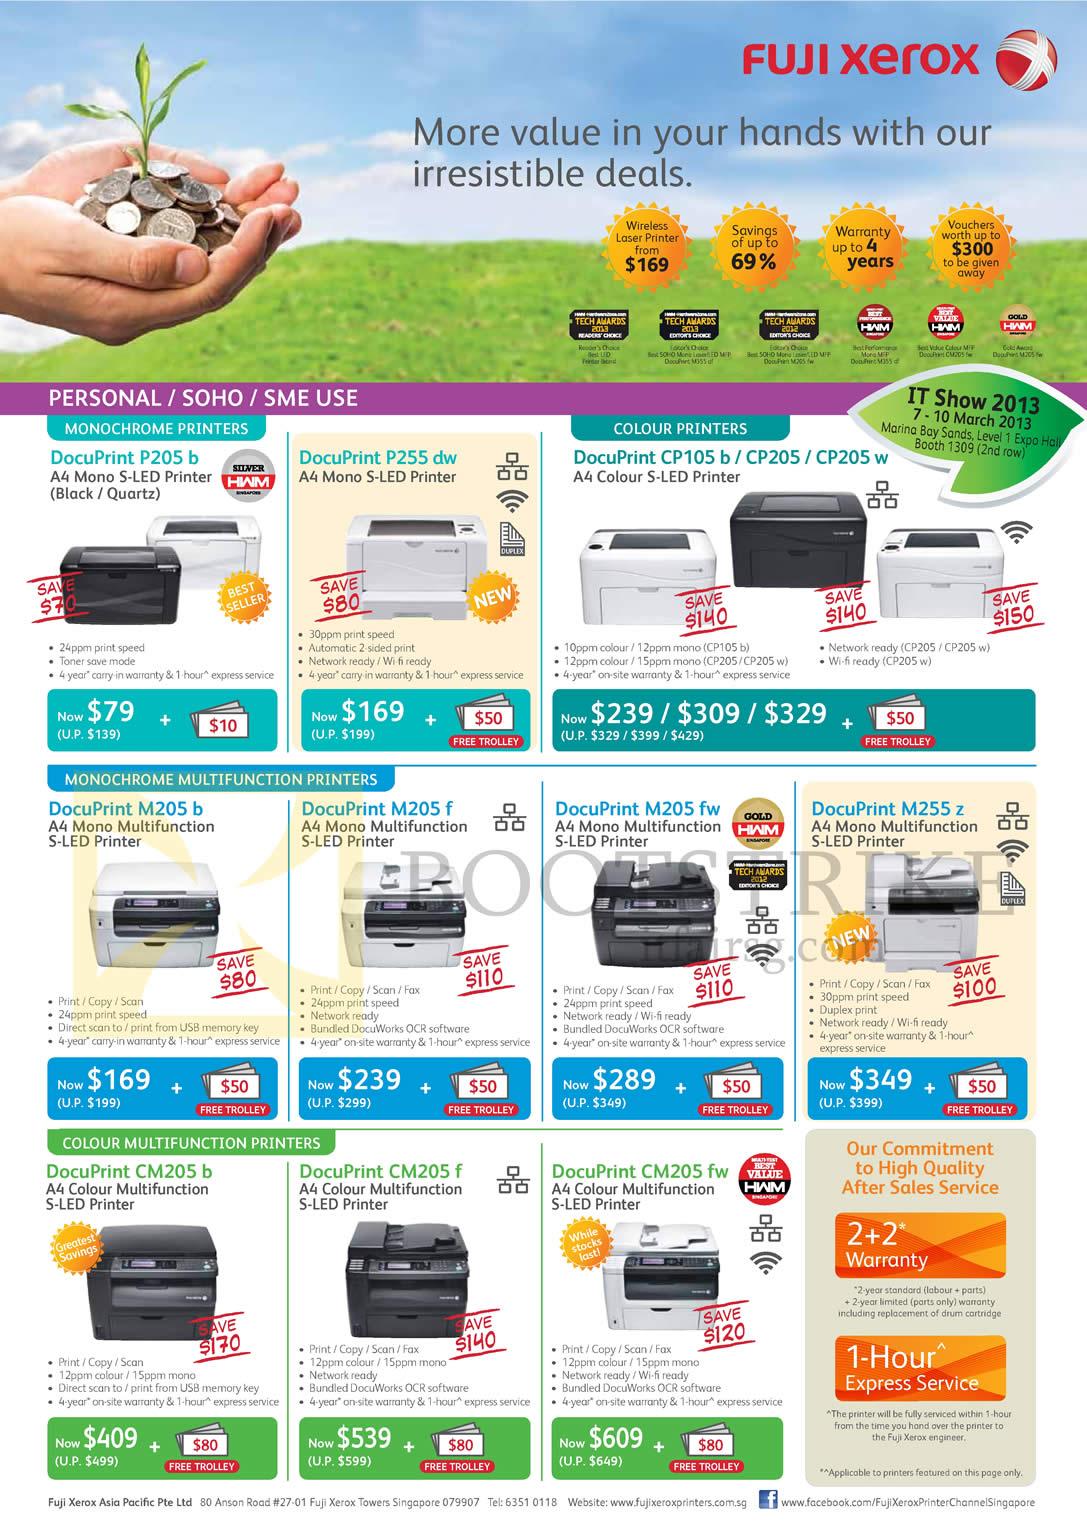 IT SHOW 2013 price list image brochure of Fujifilm Fuji Xerox Printers DocuPrint P205 B, P255d W, CP150 B, CP205 W, M205 B, M205 F, M205 Fw, M255 Z, CM205 B, CM205 F, CM205 Fw